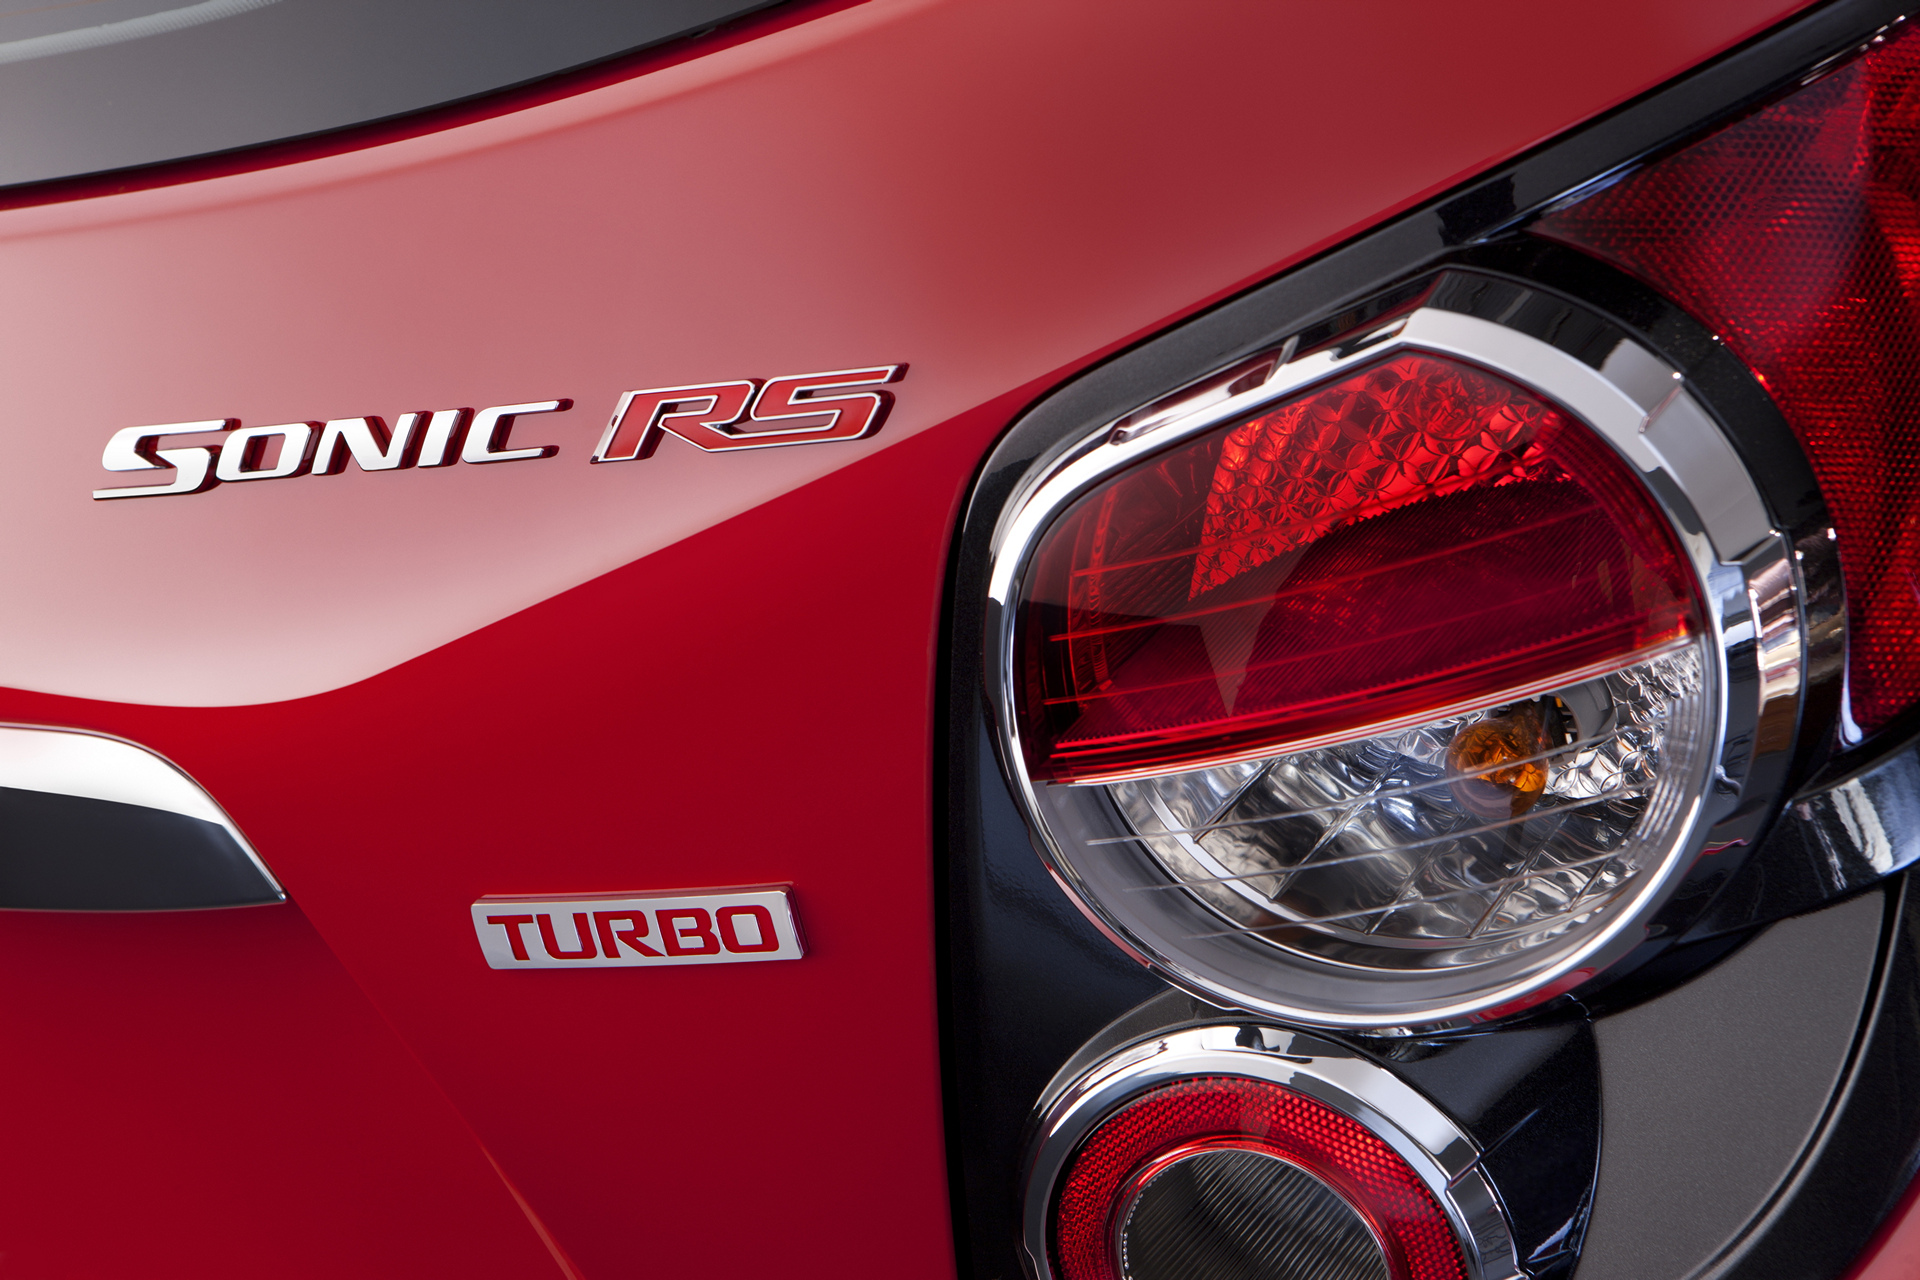 2016 Chevrolet Sonic RS © General Motors